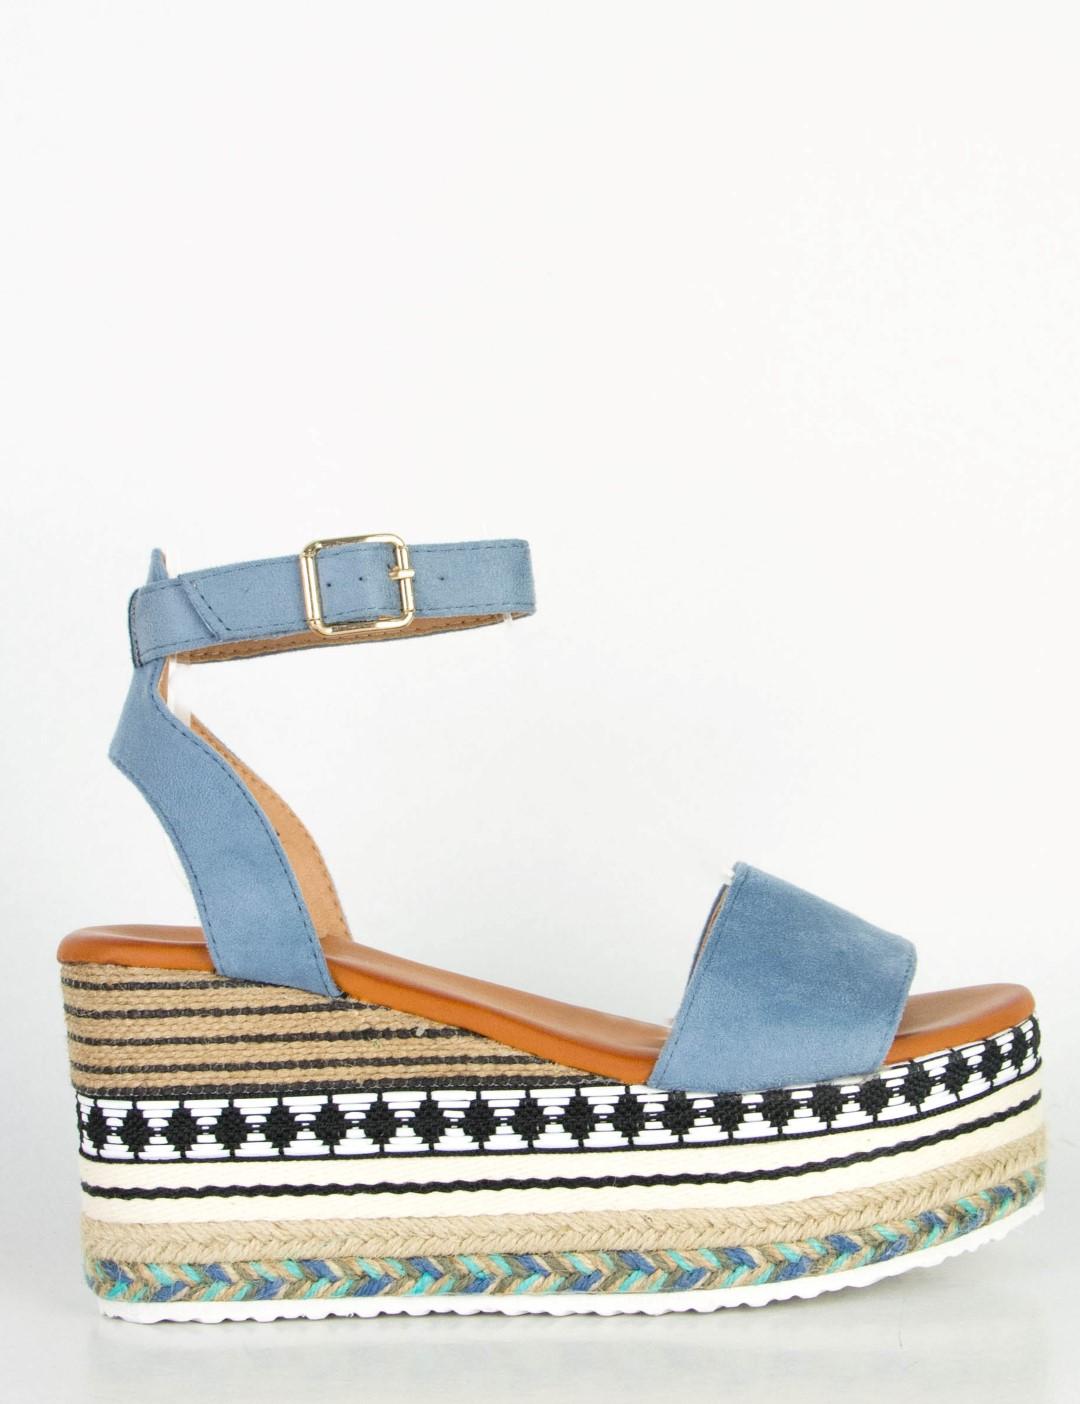 713e59c514b Γυναικεία γαλάζια σουέντ Flatforms σανδάλια με λουράκι Q52Z